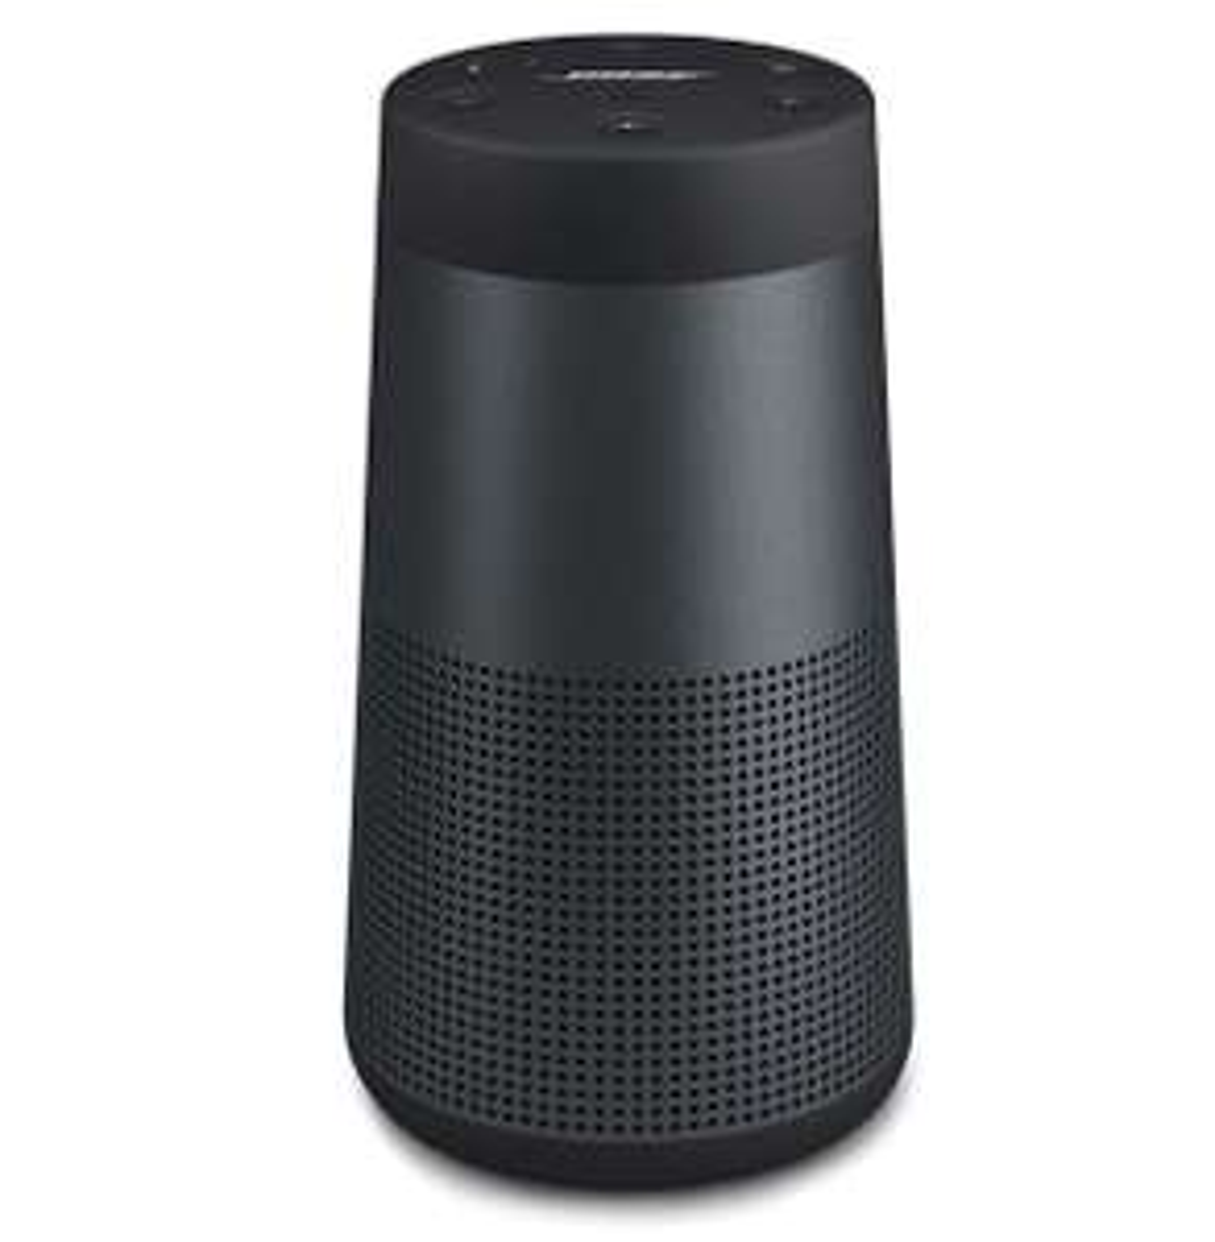 [amazon.de]  BOSE SoundLink Revolve Bluetooth Lautsprecher Schwarz